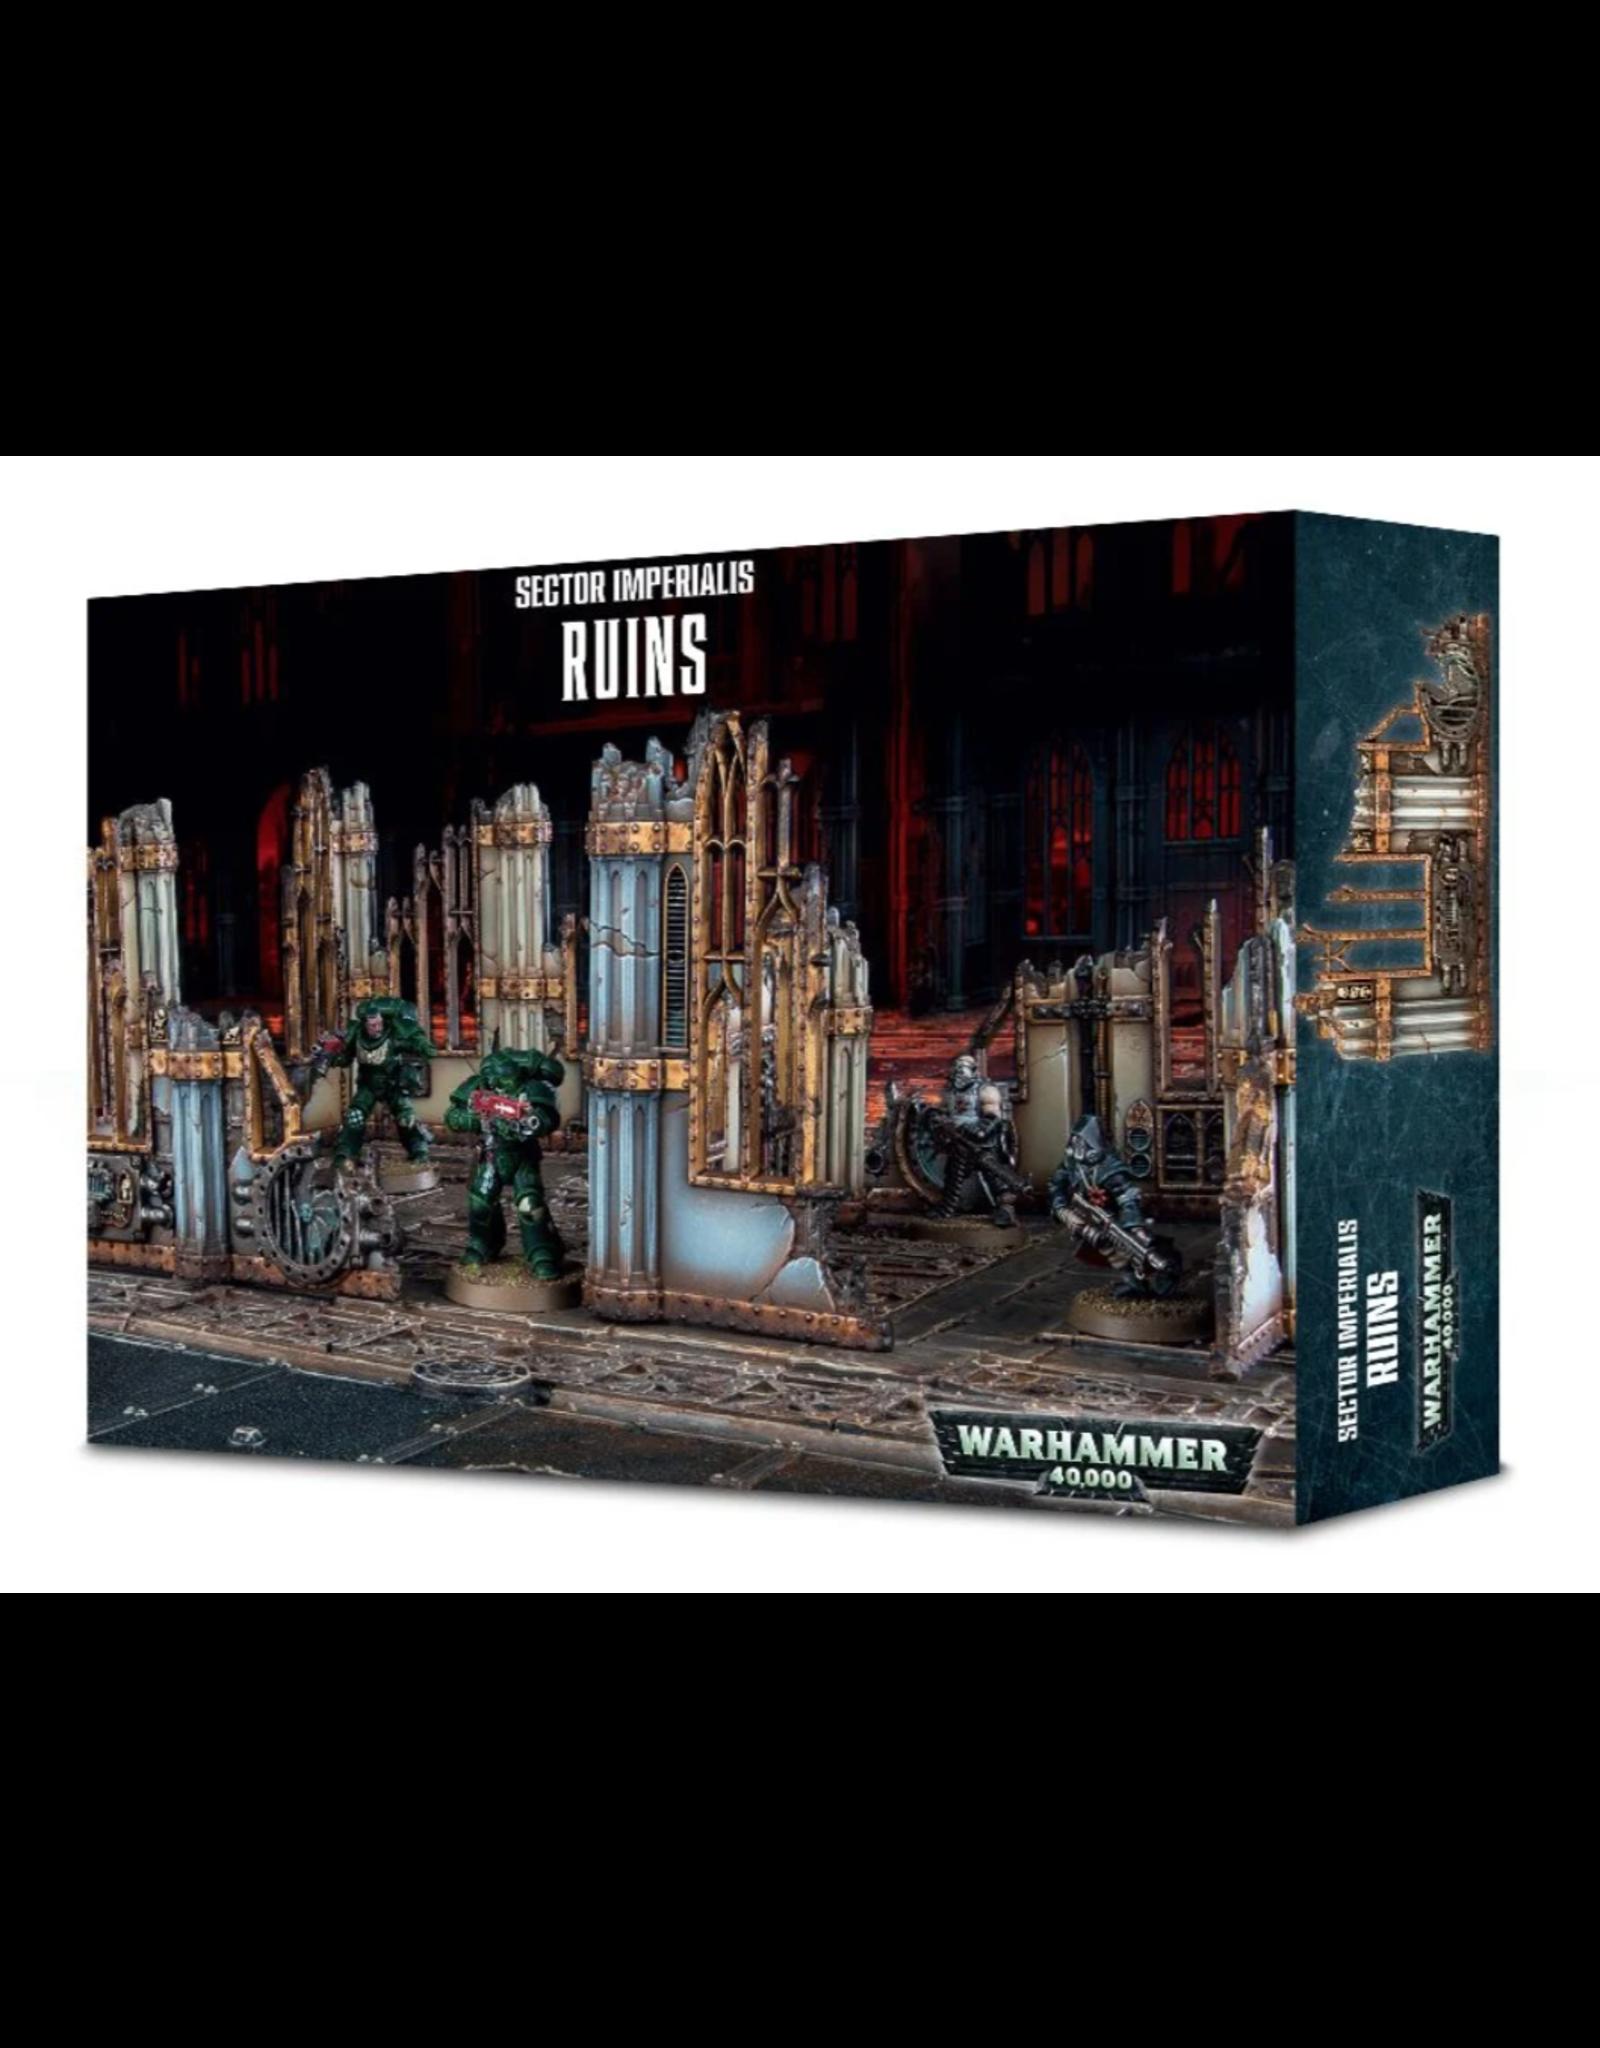 Warhammer 40K Sector Imperialis: Ruins